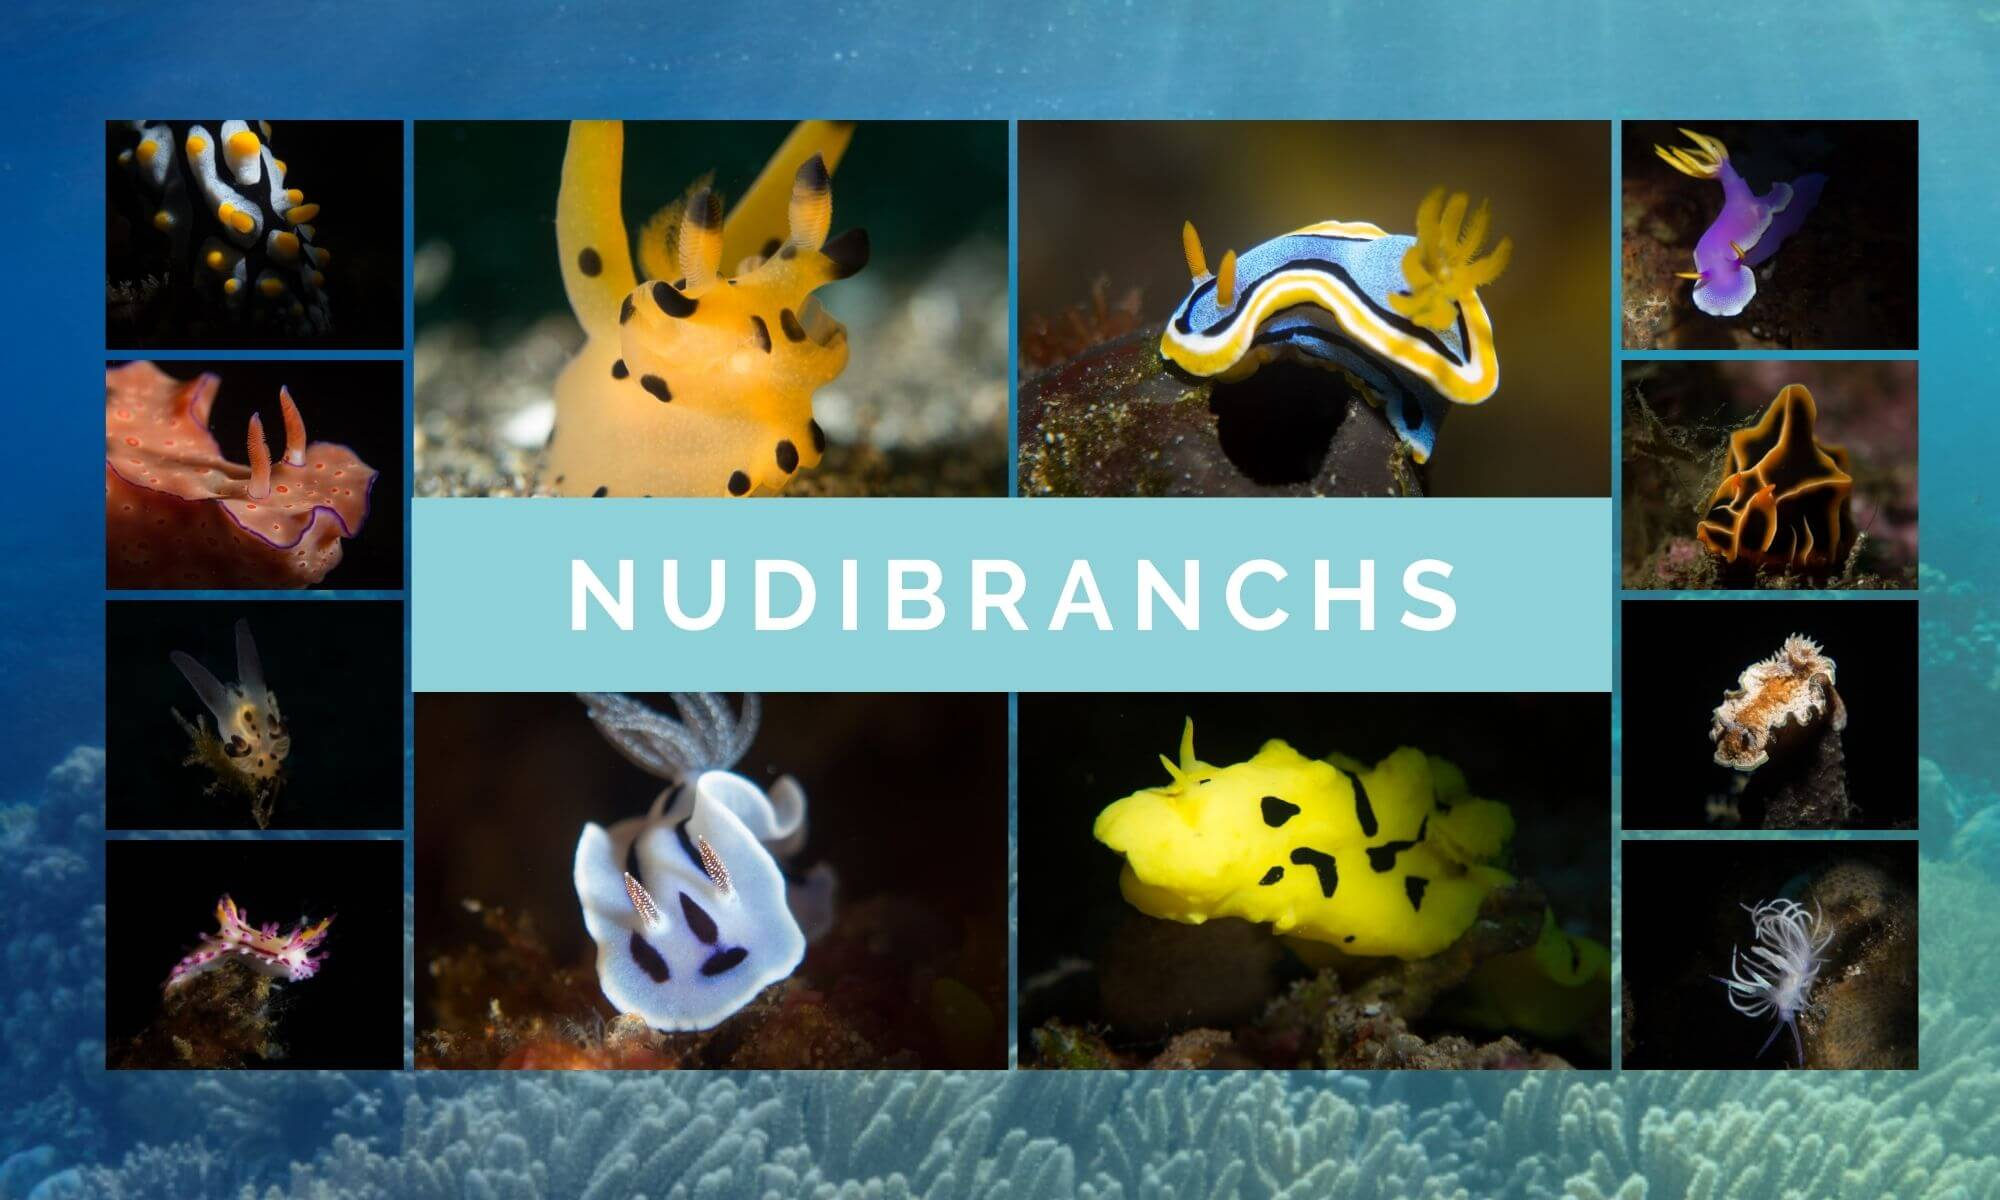 Marine Life Nudibranchs